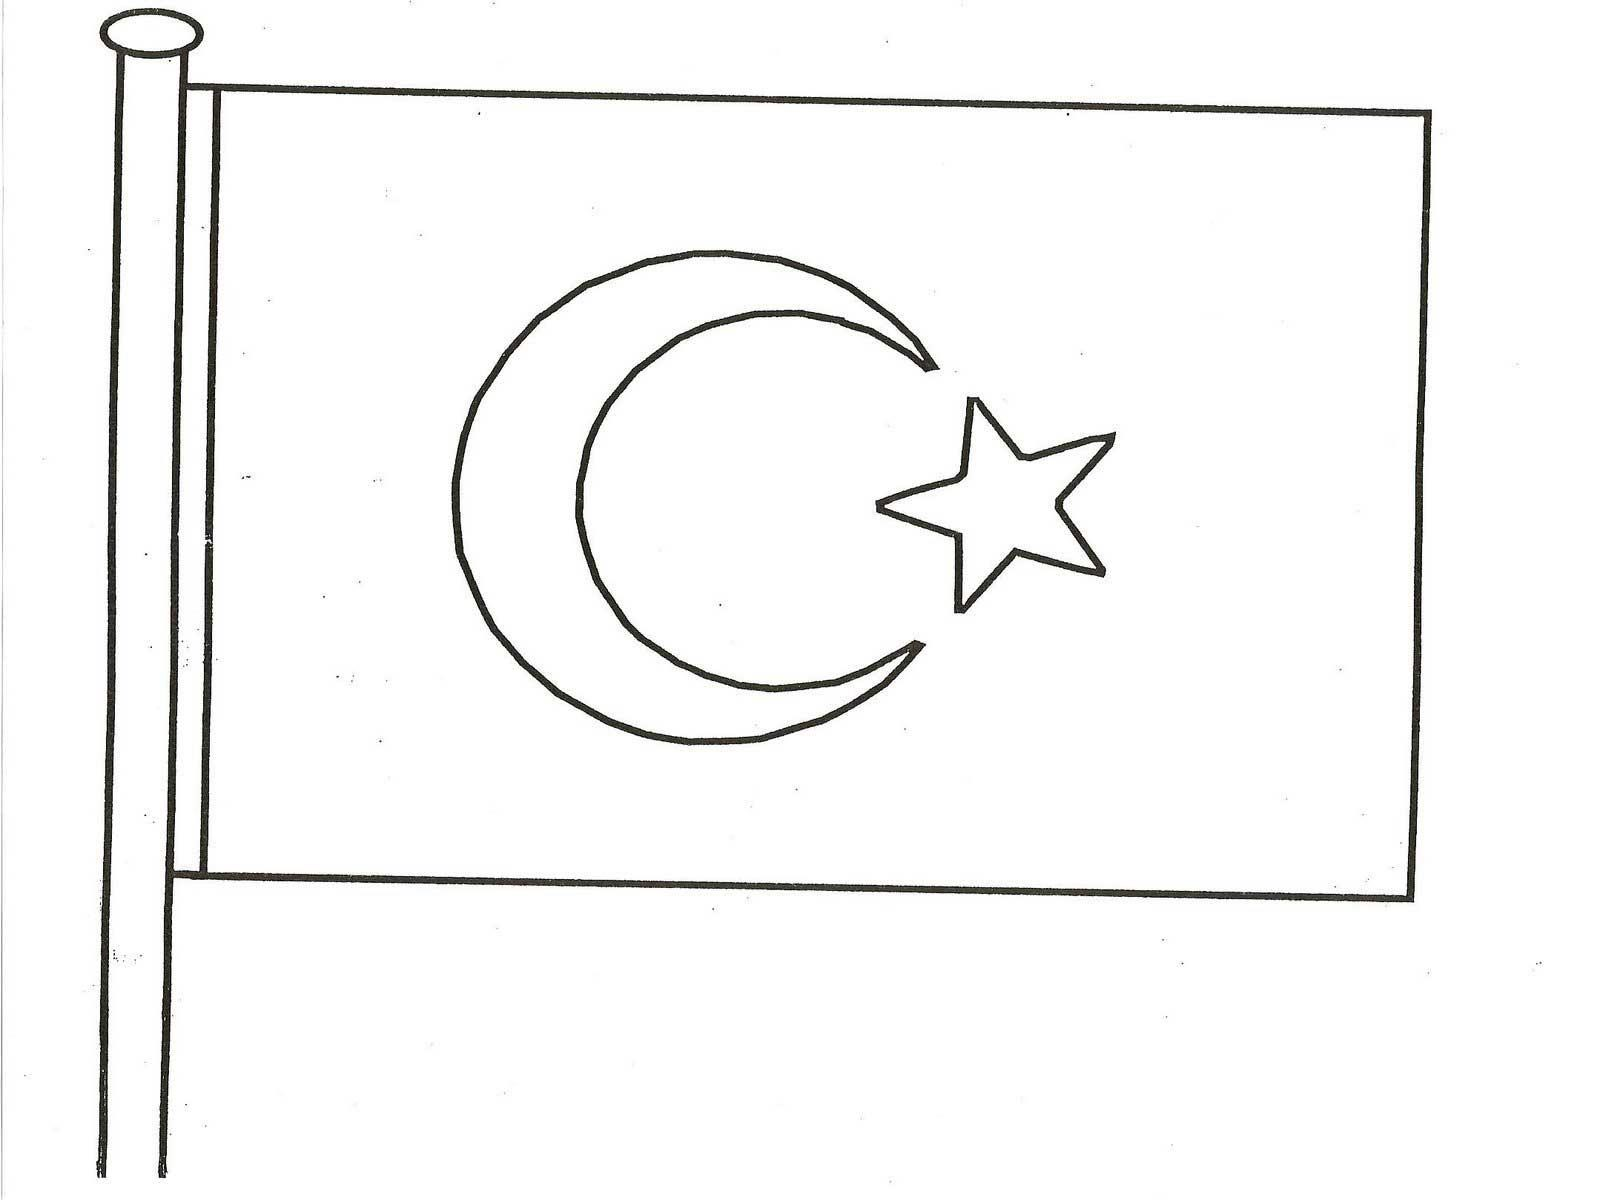 Turk-Bayragi-Boyama-Kagidi-Calismasi-2